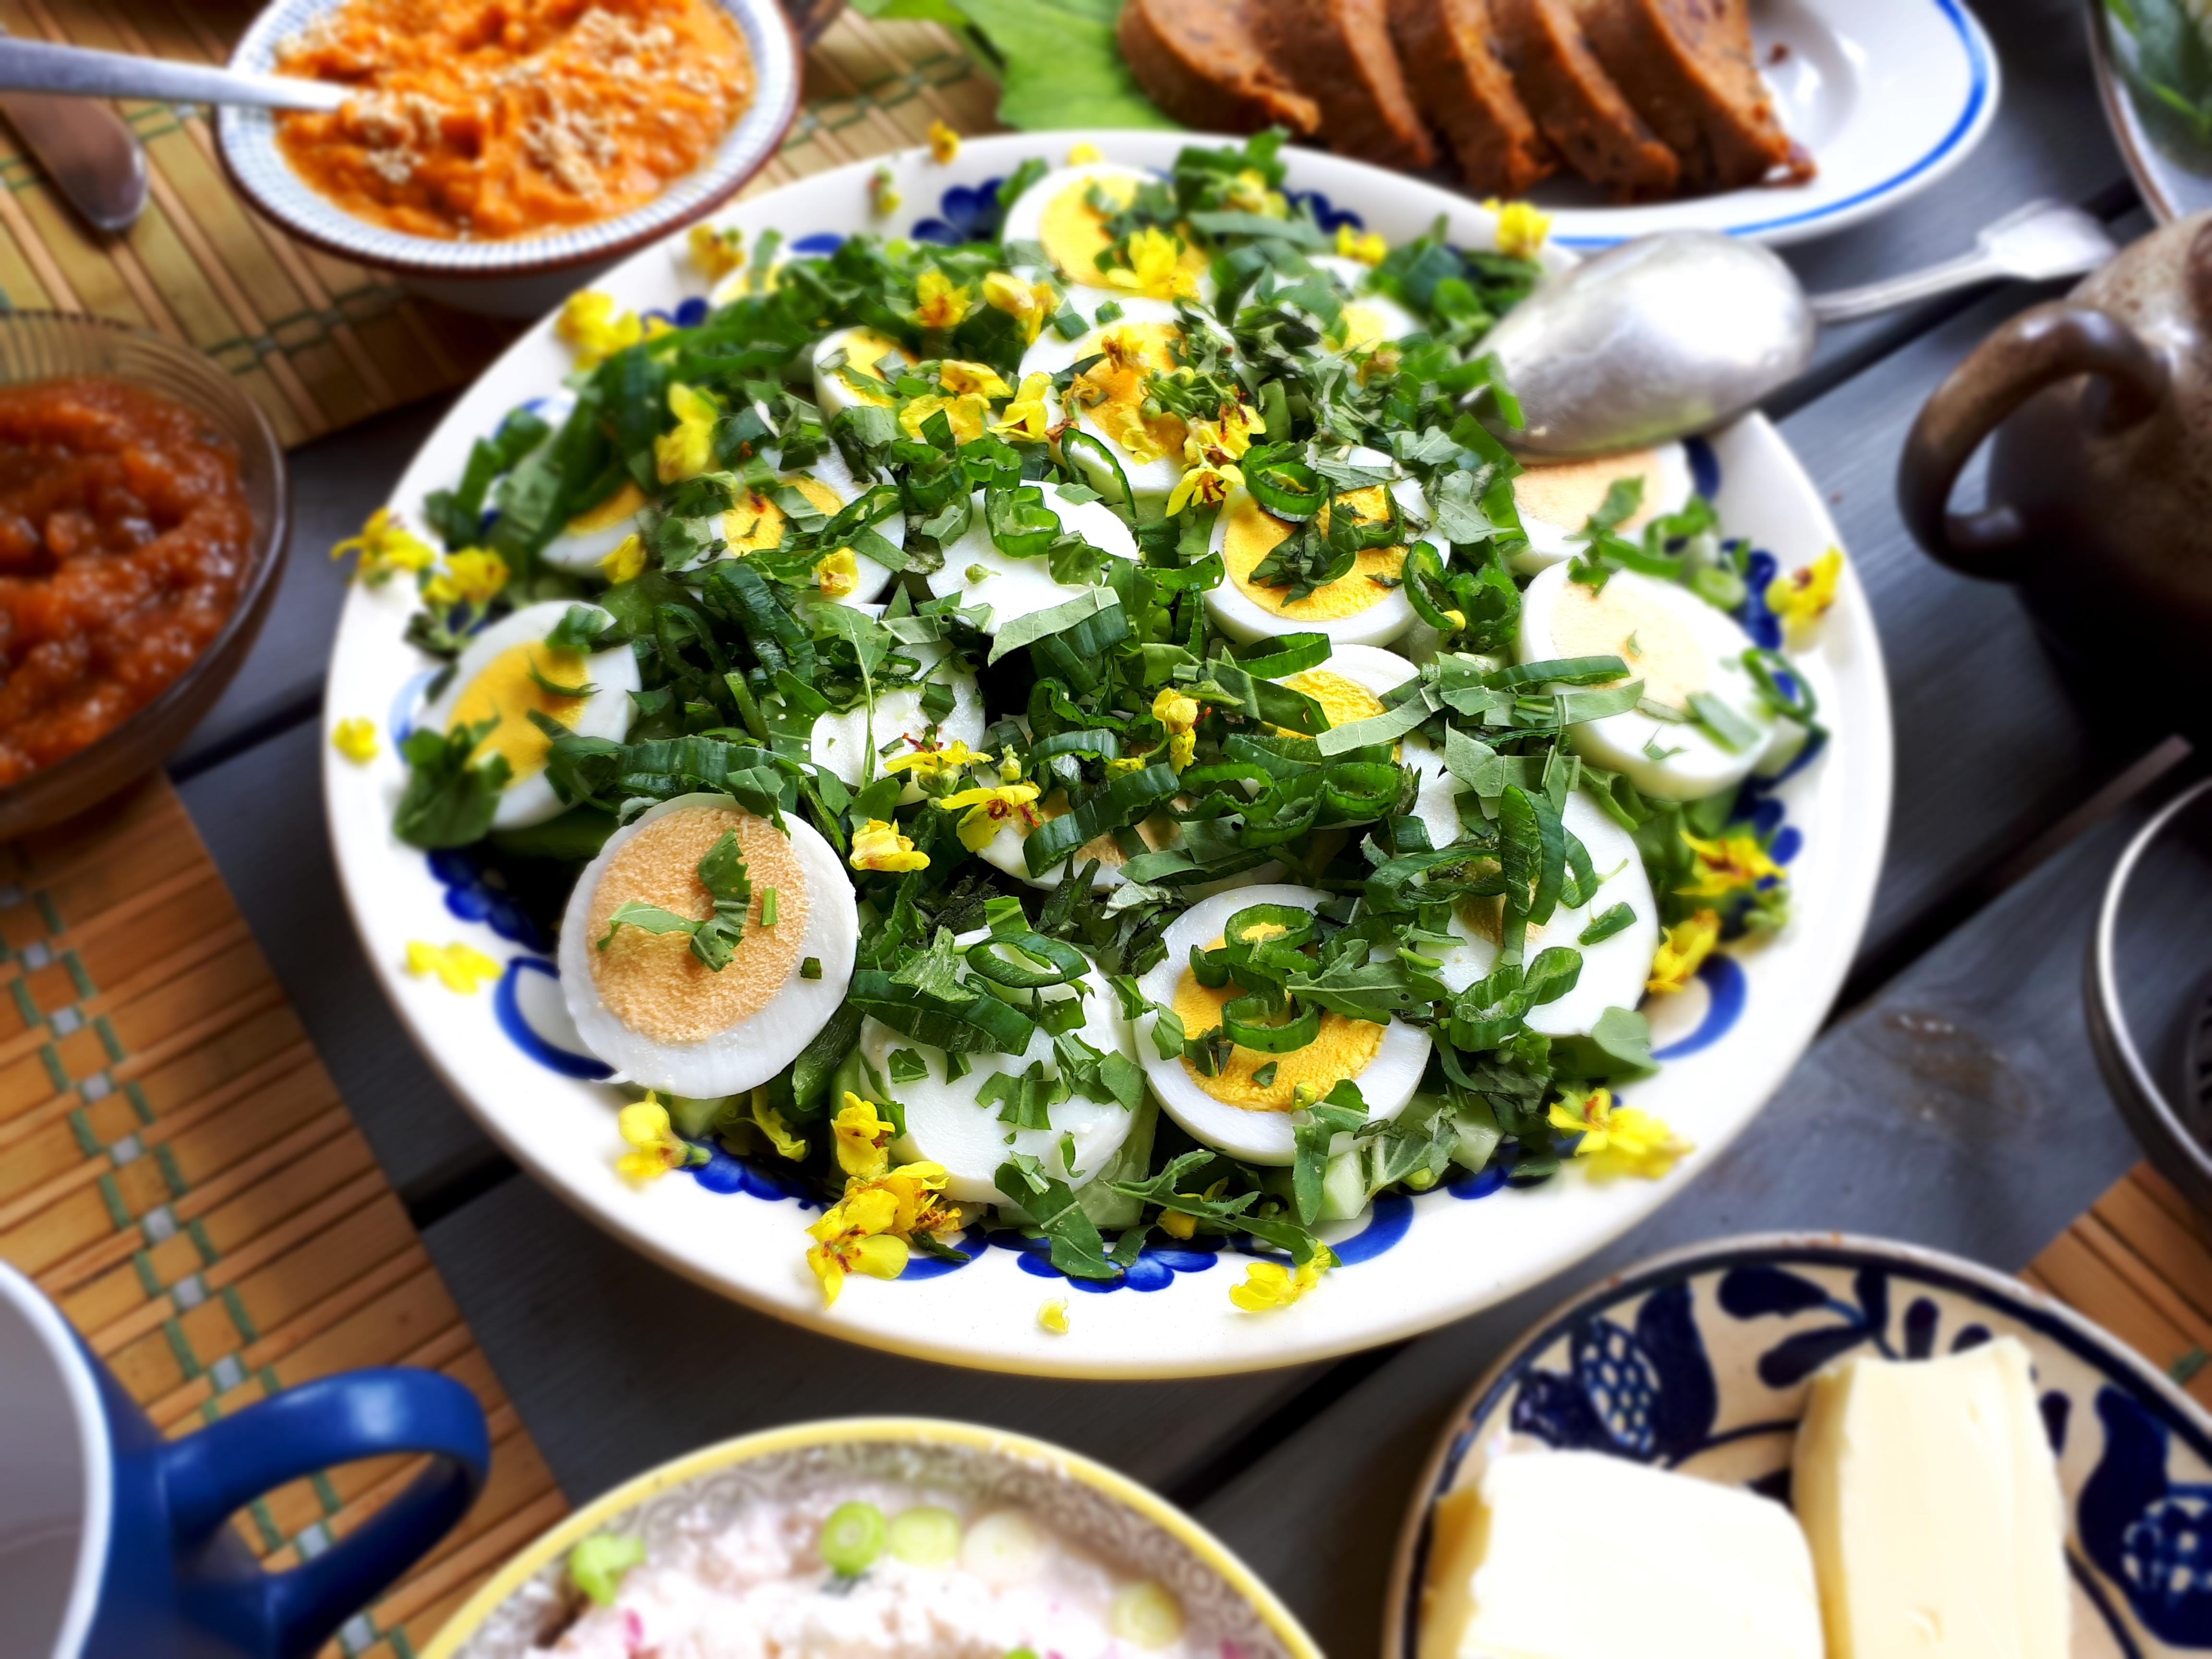 Beskid Masala IndoChata - What will I eat?